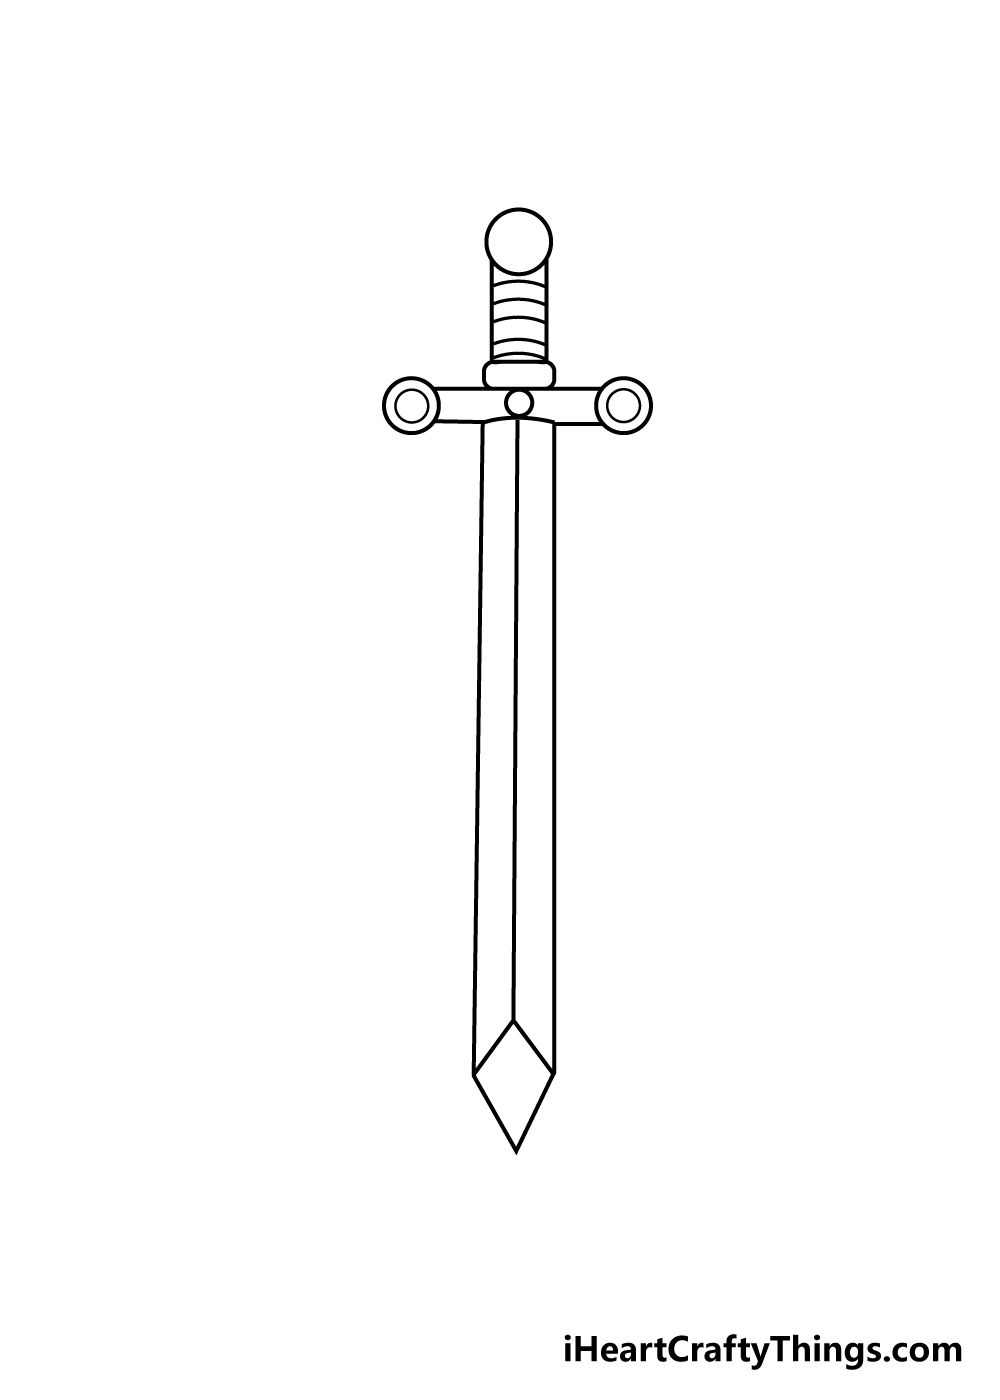 sword drawing step 6